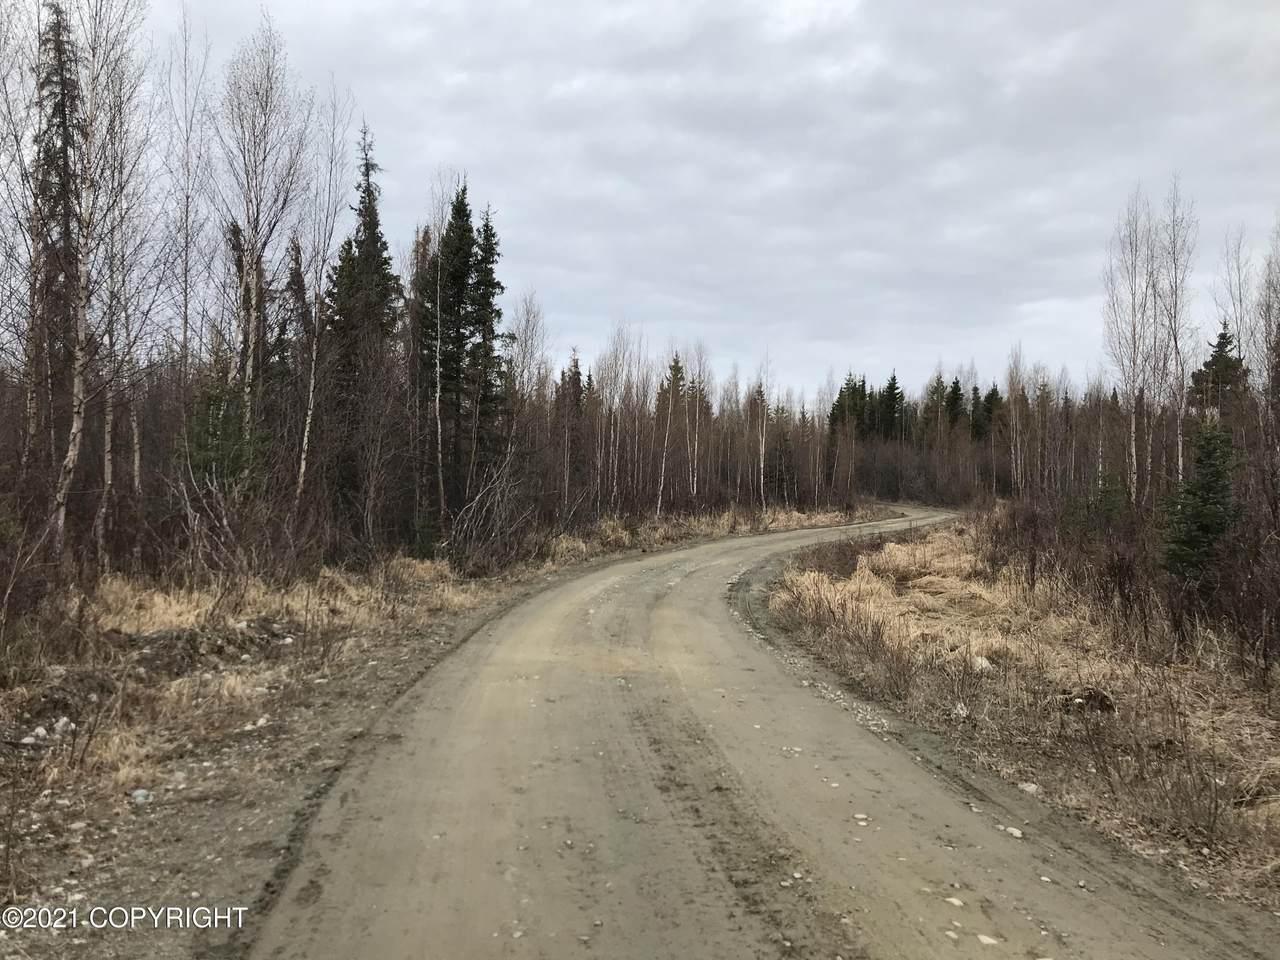 https://bt-photos.global.ssl.fastly.net/alaska/1280_boomver_1_21-7792-2.jpg